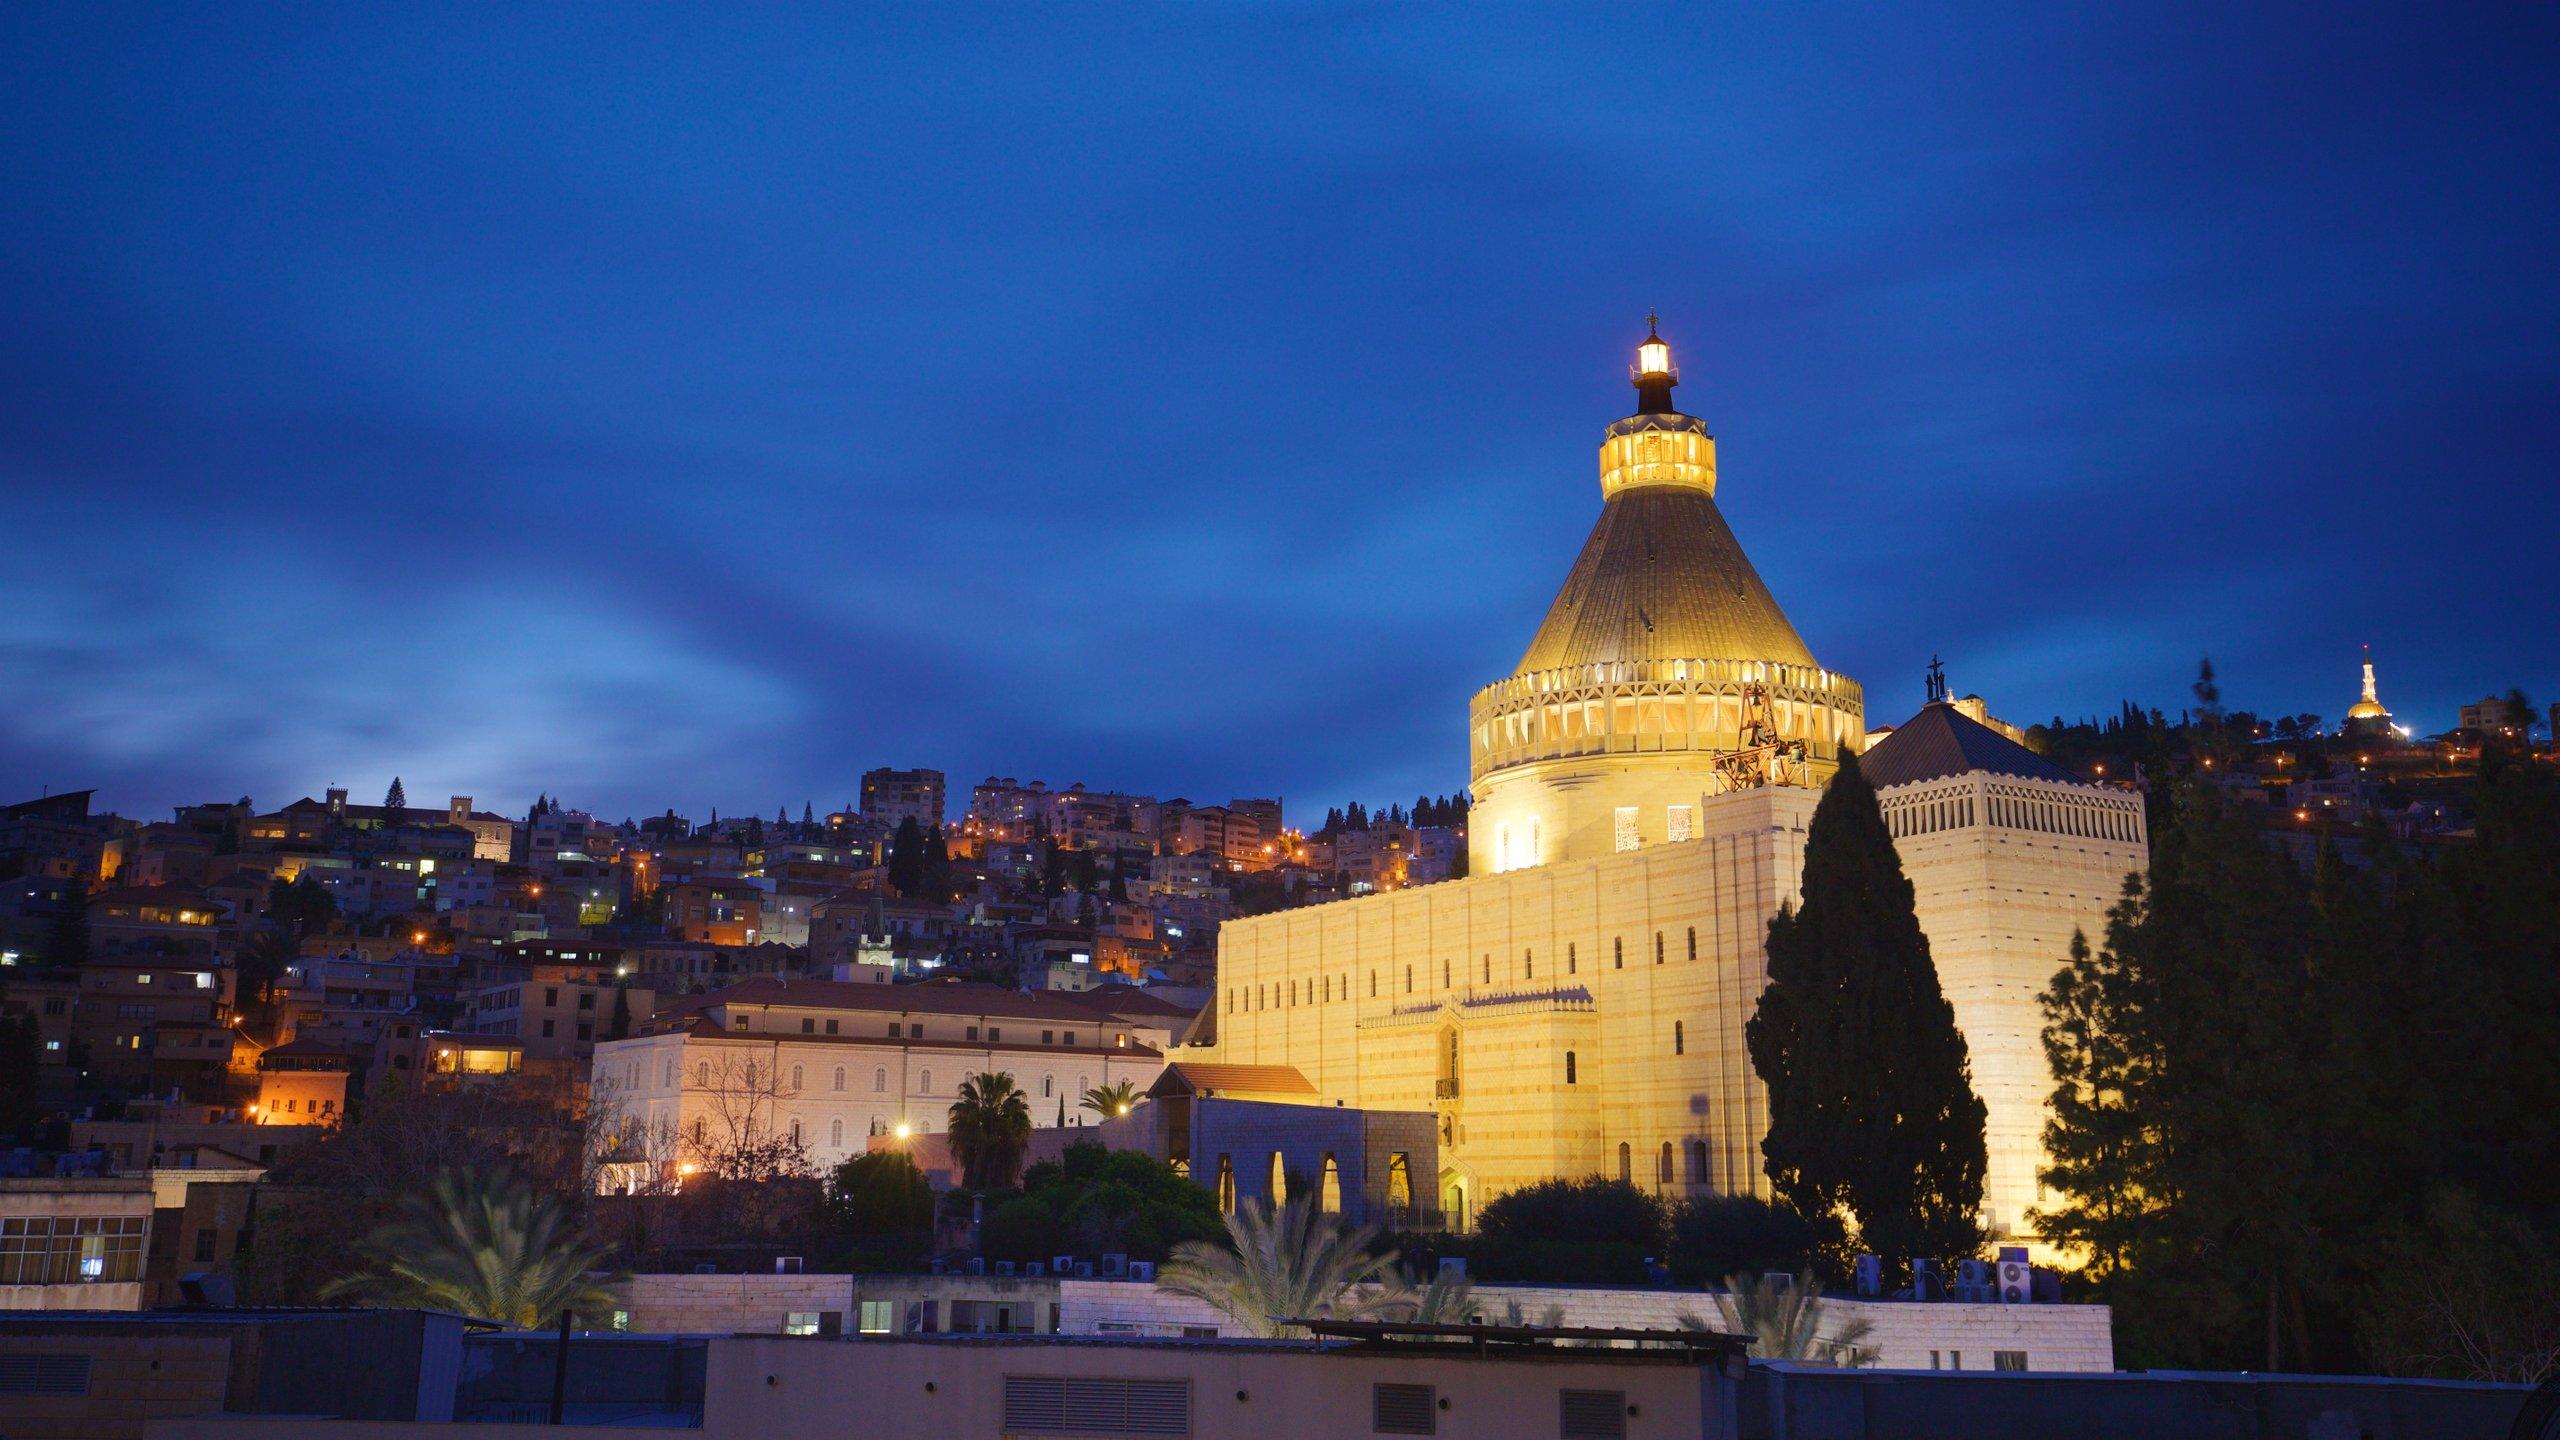 Basilica of the Annunciation, Nazareth, Northern District, Israel